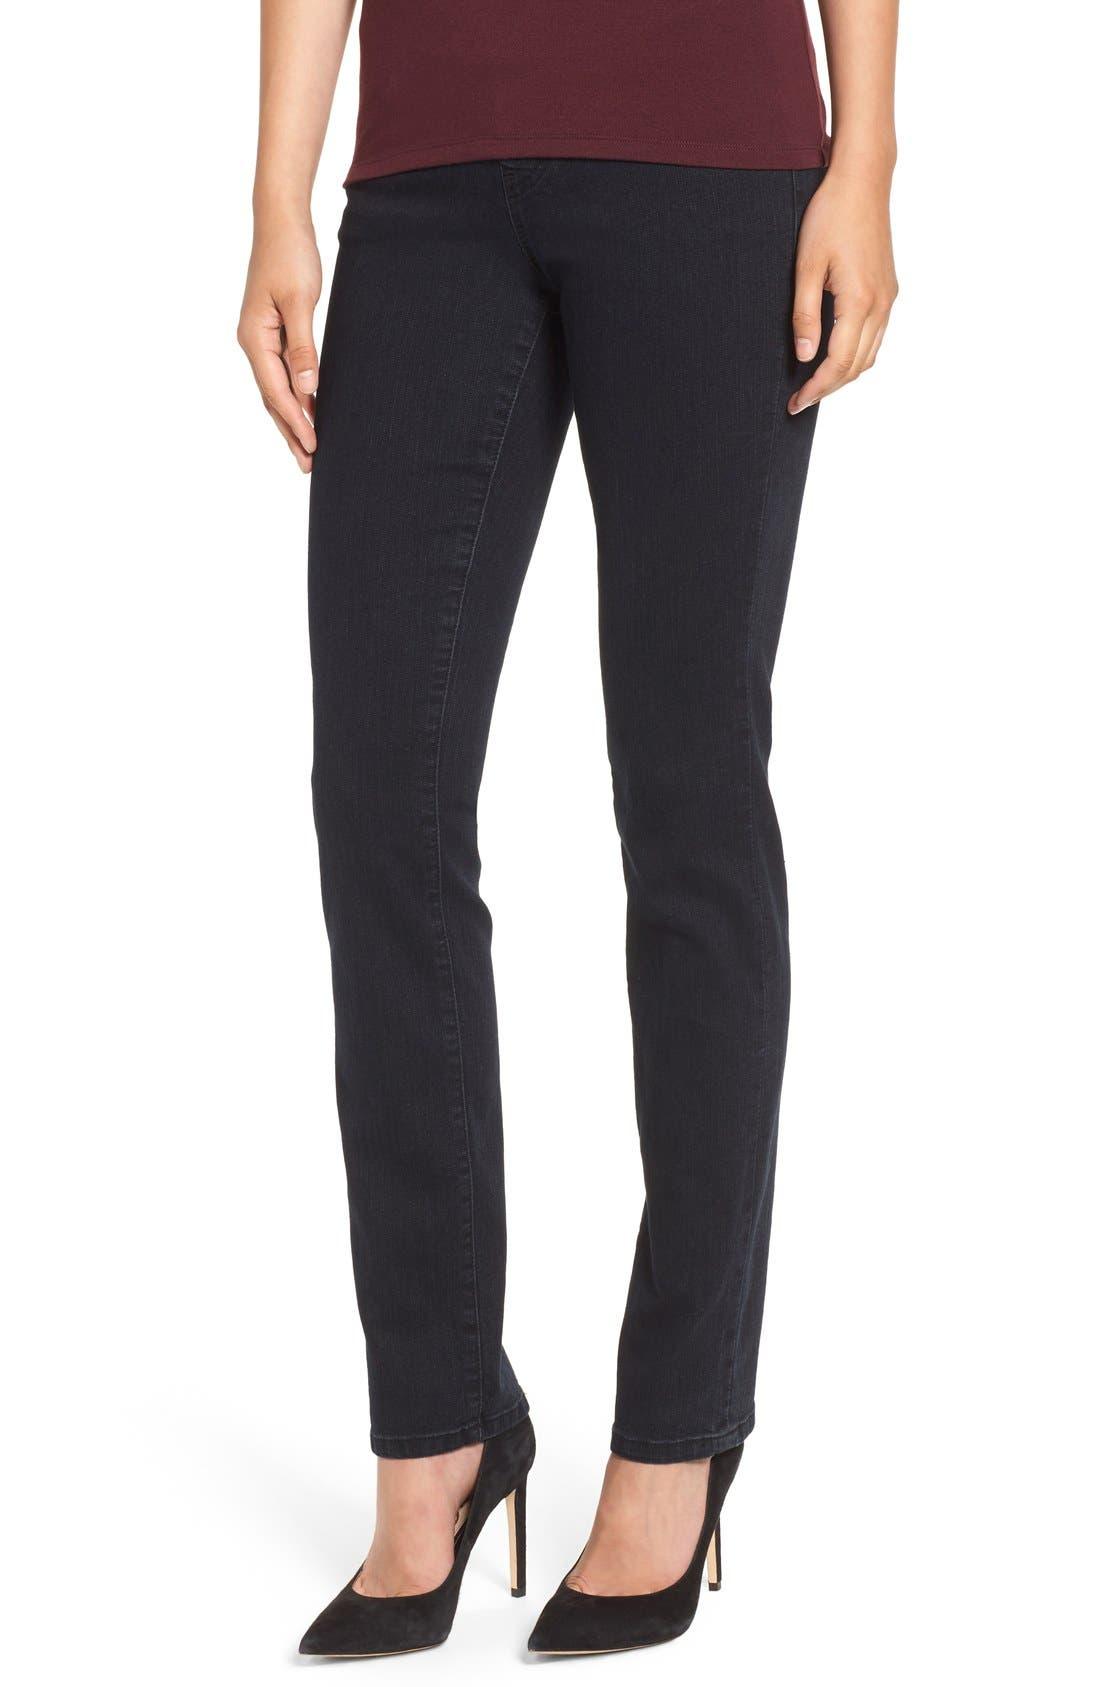 Main Image - Jag Jeans 'Peri' Straight Leg Pull-On Jeans (Black Void) (Regular & Petite) (Online Only)